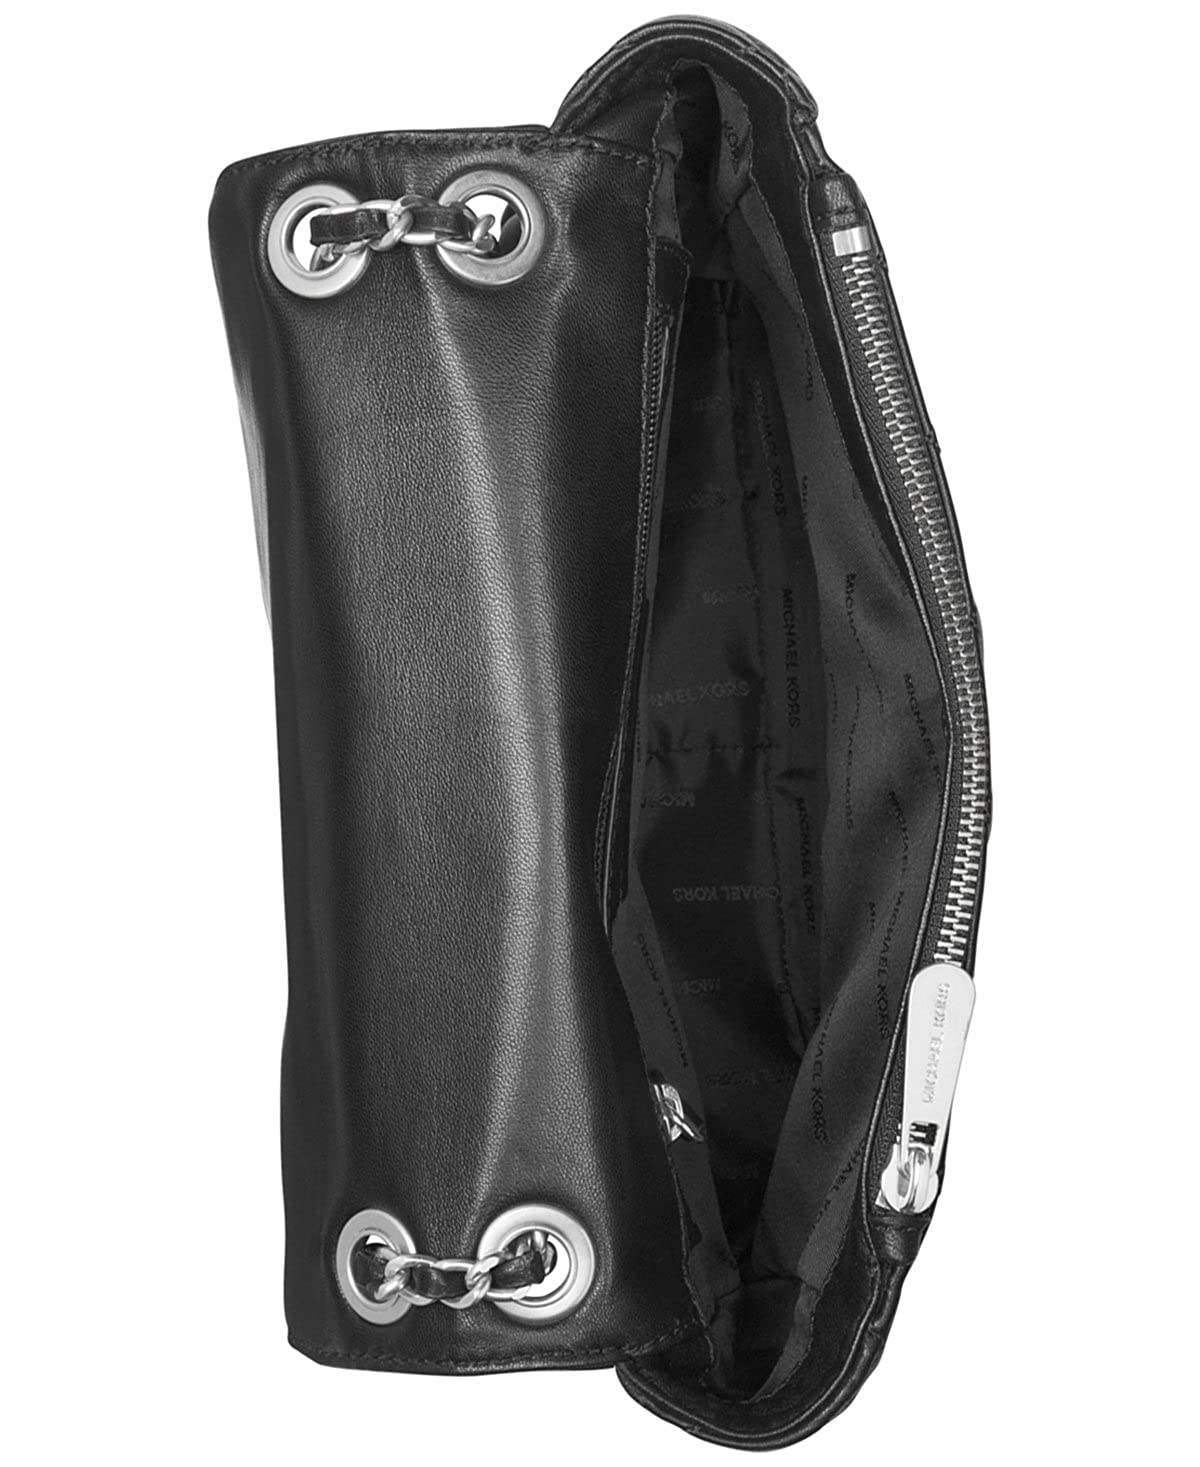 5c4b5c8cb18a Amazon.com: MICHAEL Michael Kors Womens Cheyenne Leather Quilted Satchel  Handbag Black Small: Clothing